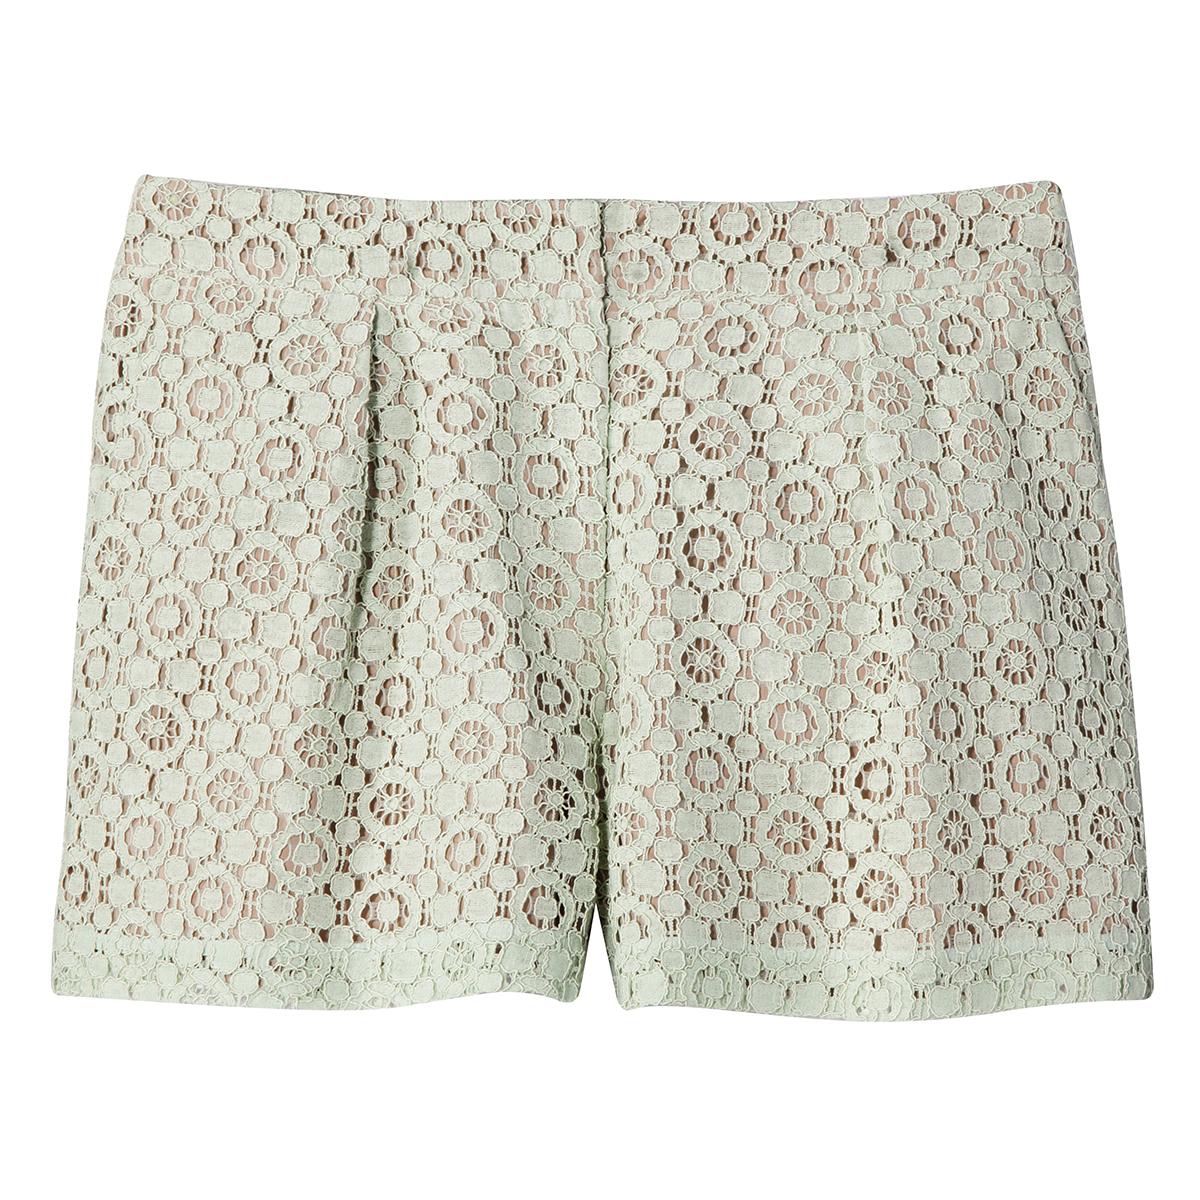 Mint Green Lace Shorts, $28